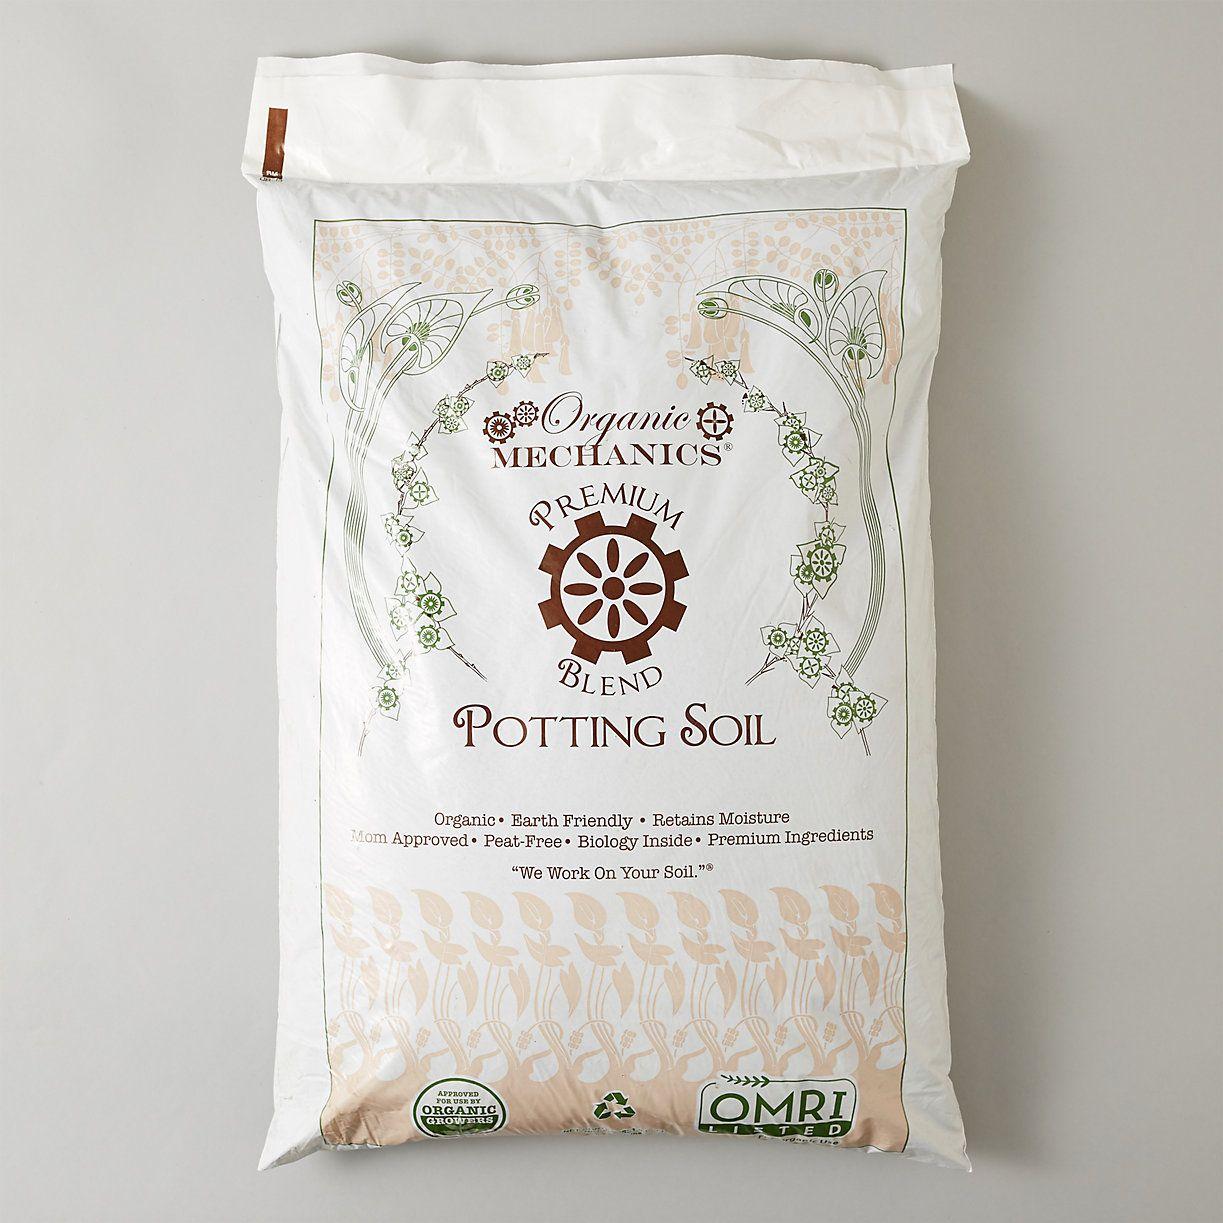 Organic Mechanics Premium Blend Potting Soil